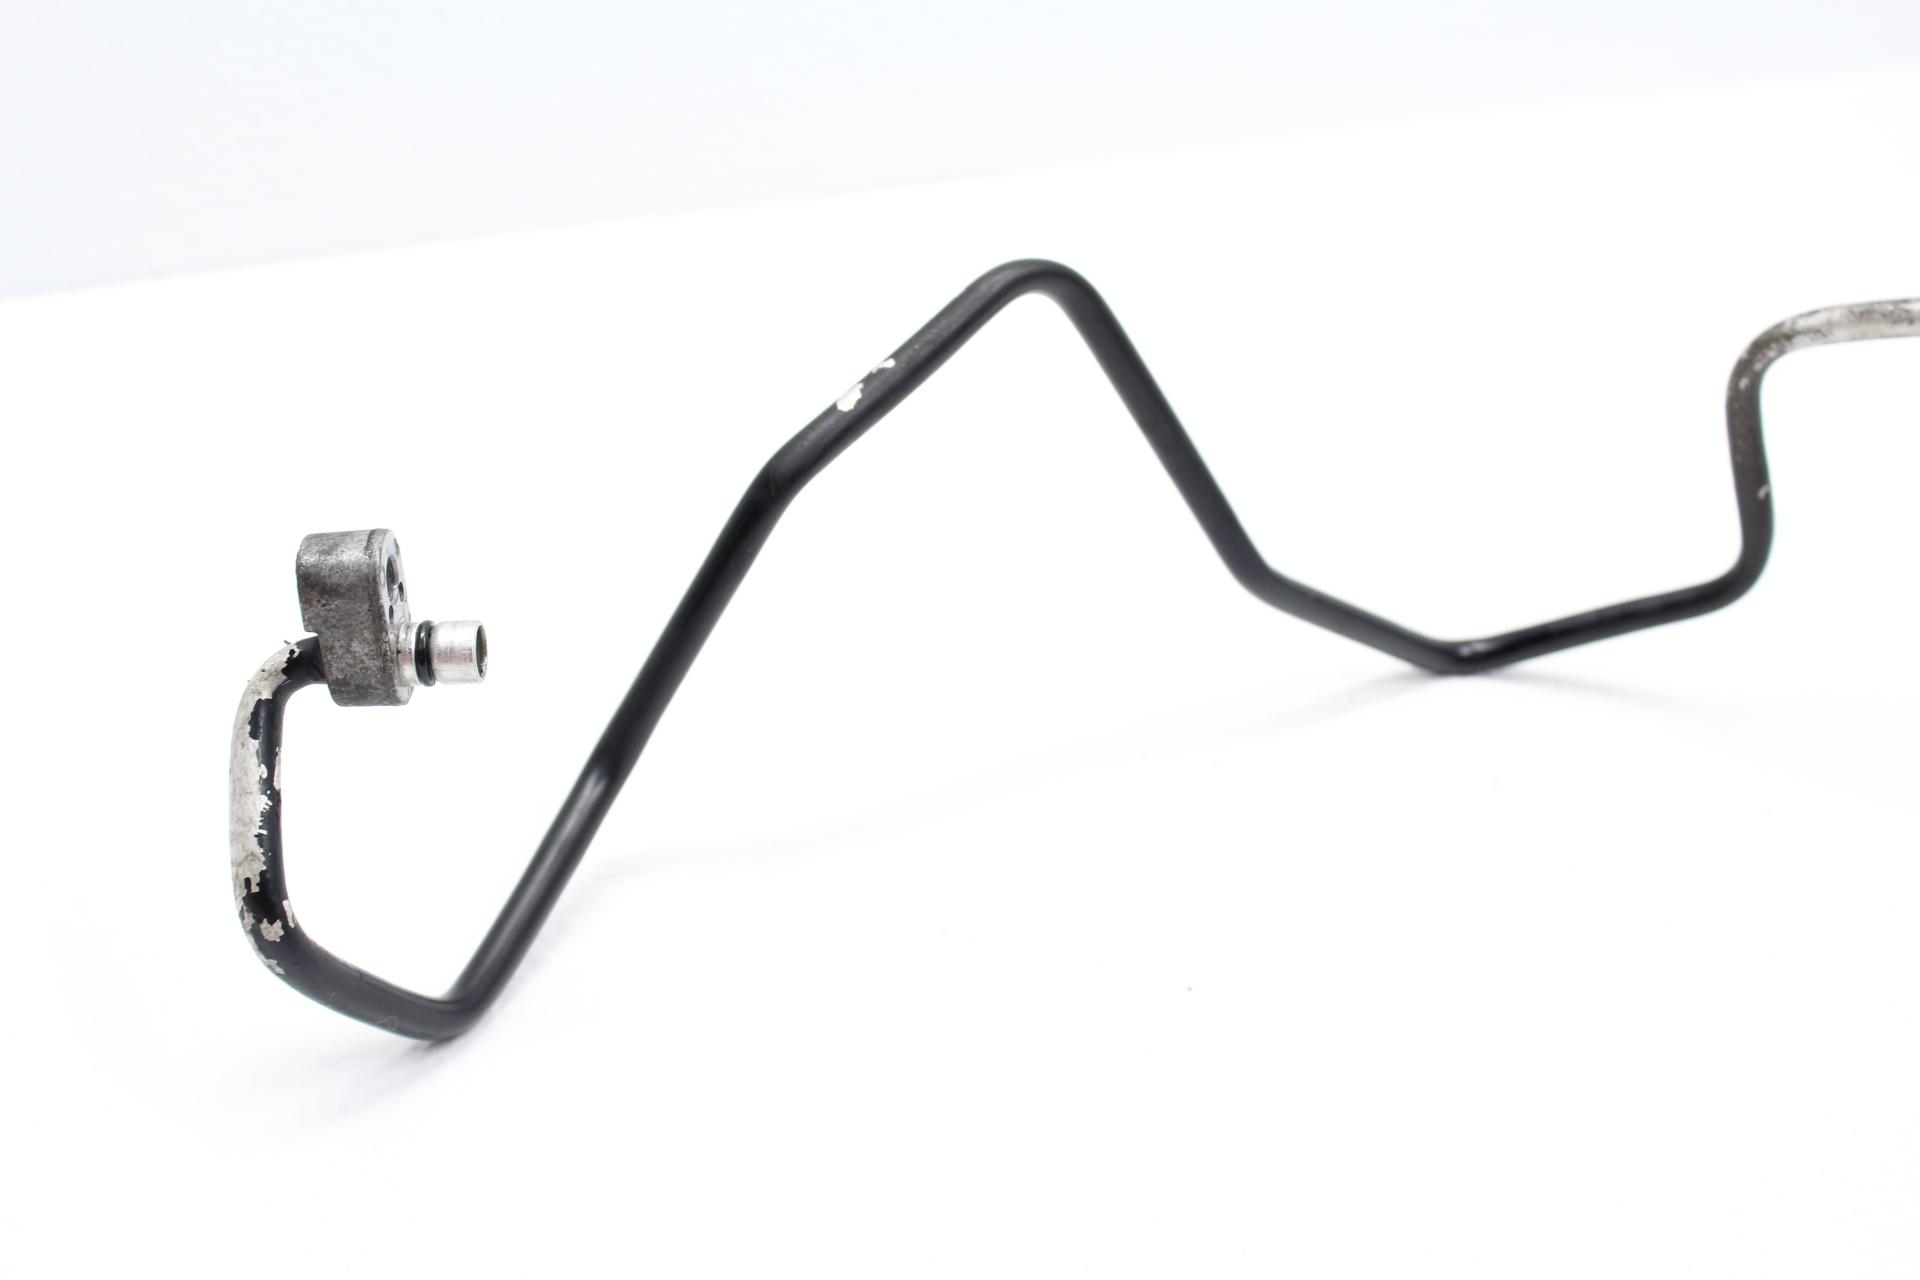 Subaru Impreza Wrx Amp Sti Ac Hard Lines Aluminum